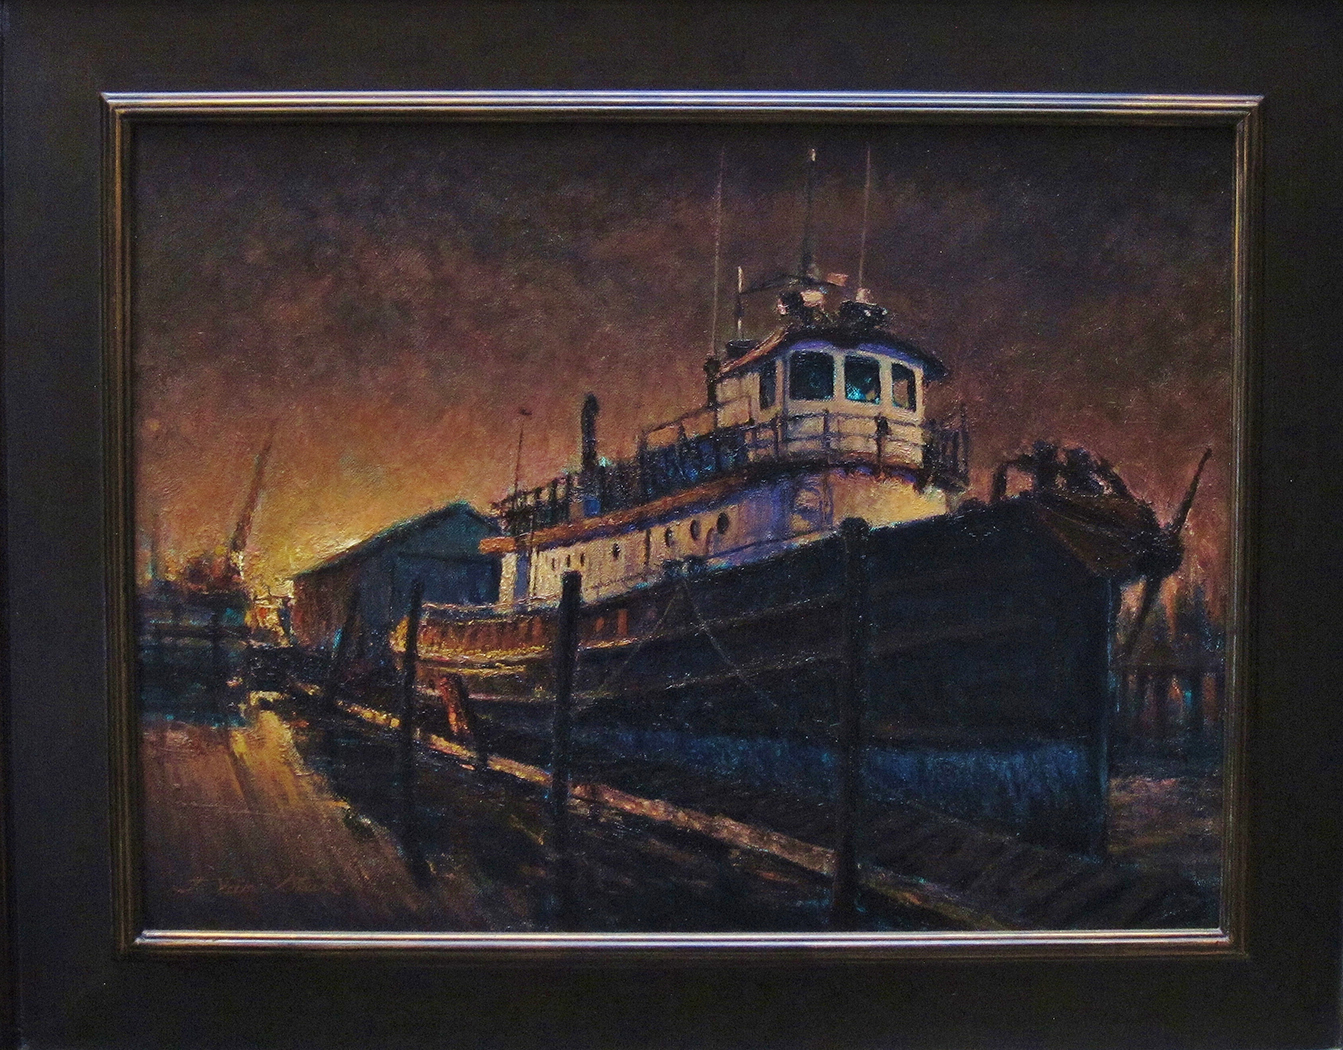 Harbor Tug Nocturne, 18 x 24 inches